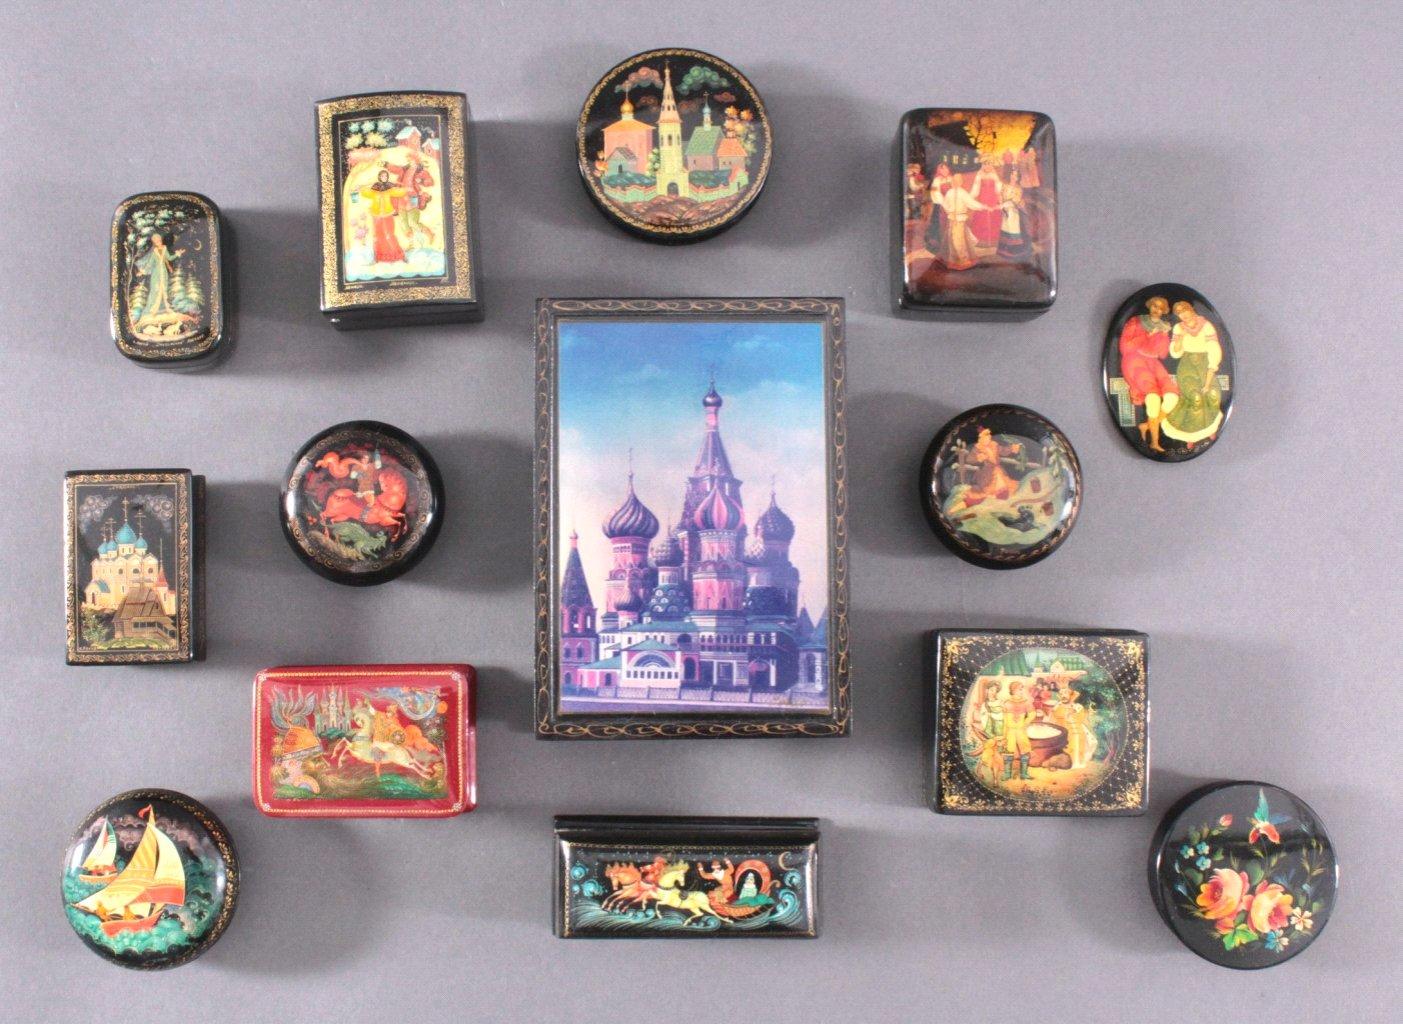 Sammlung Palech, handbemalte russische Lackdosen